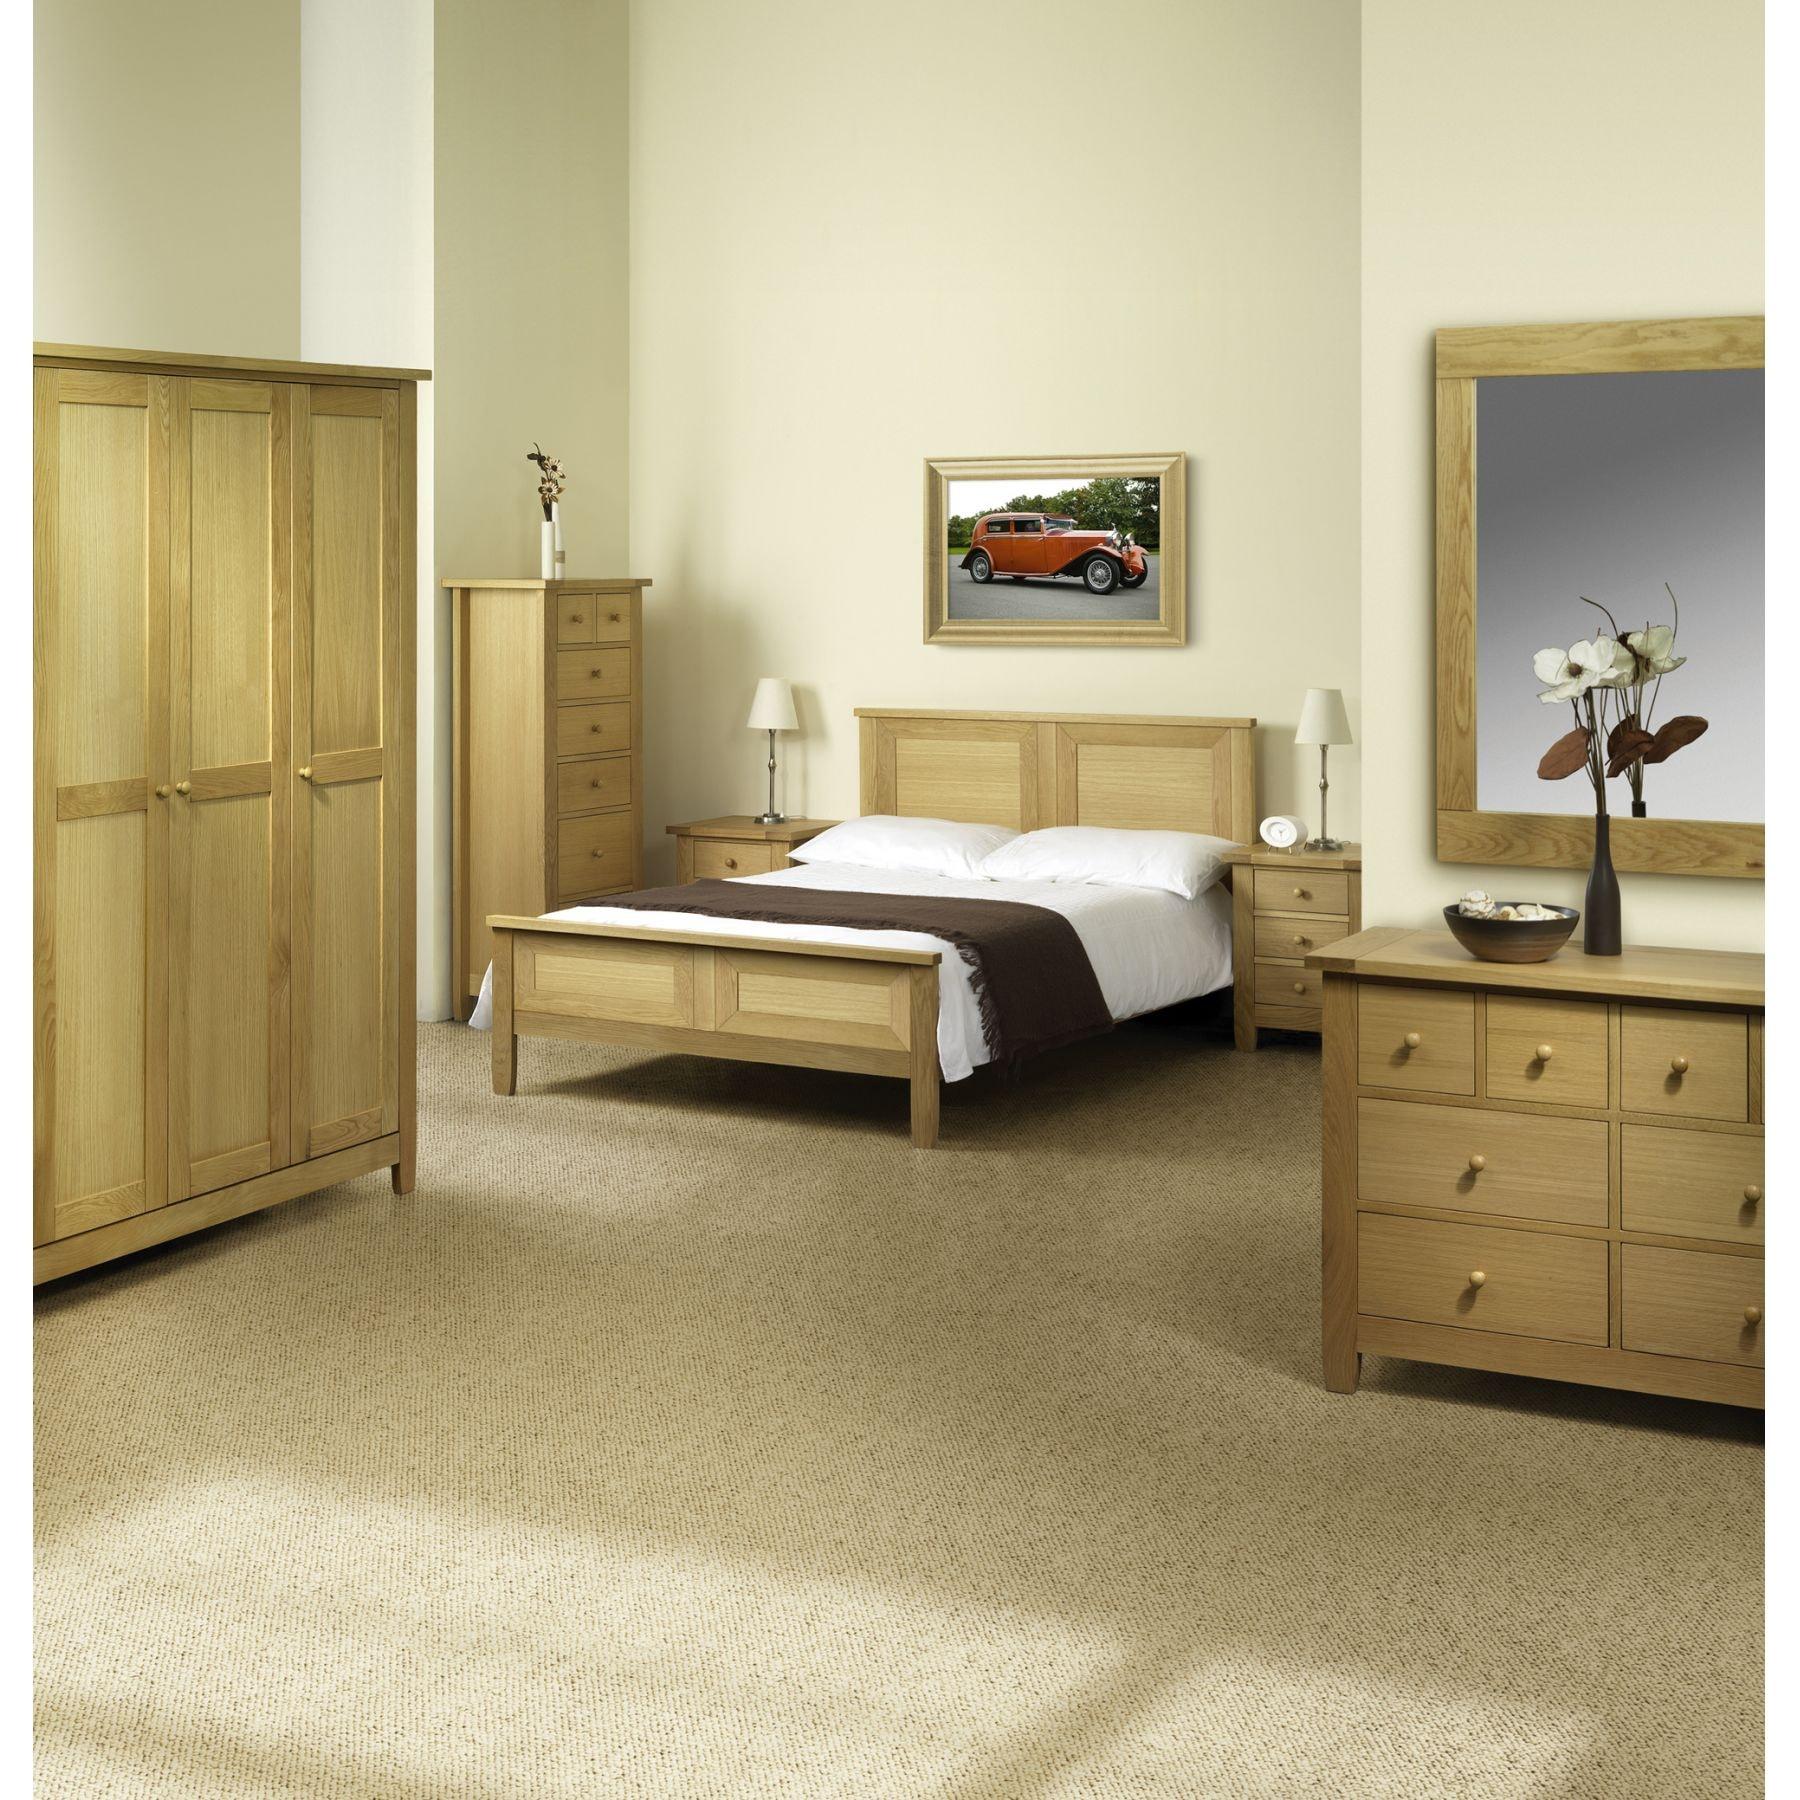 Lyndhurst Bedroom Furniture 2 Door Wardrobe